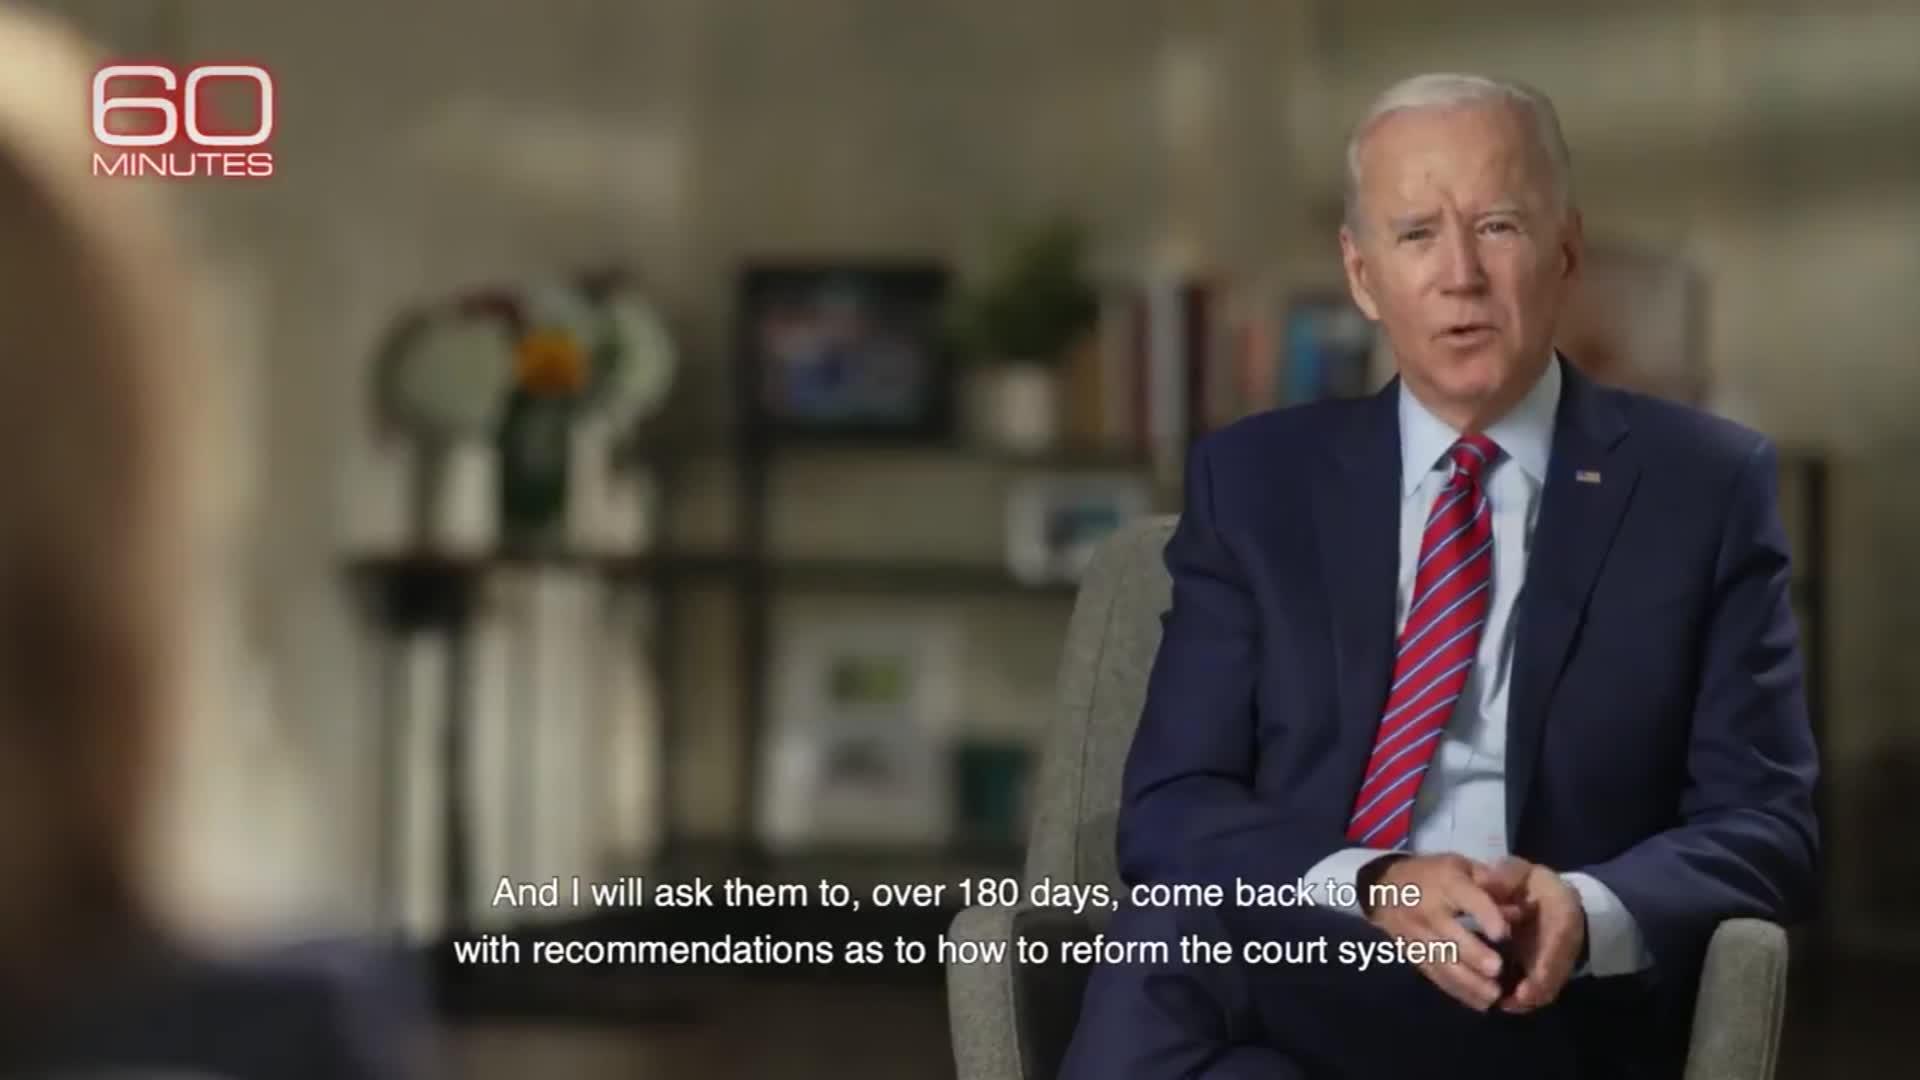 Fact-checking Biden on '60 Minutes'